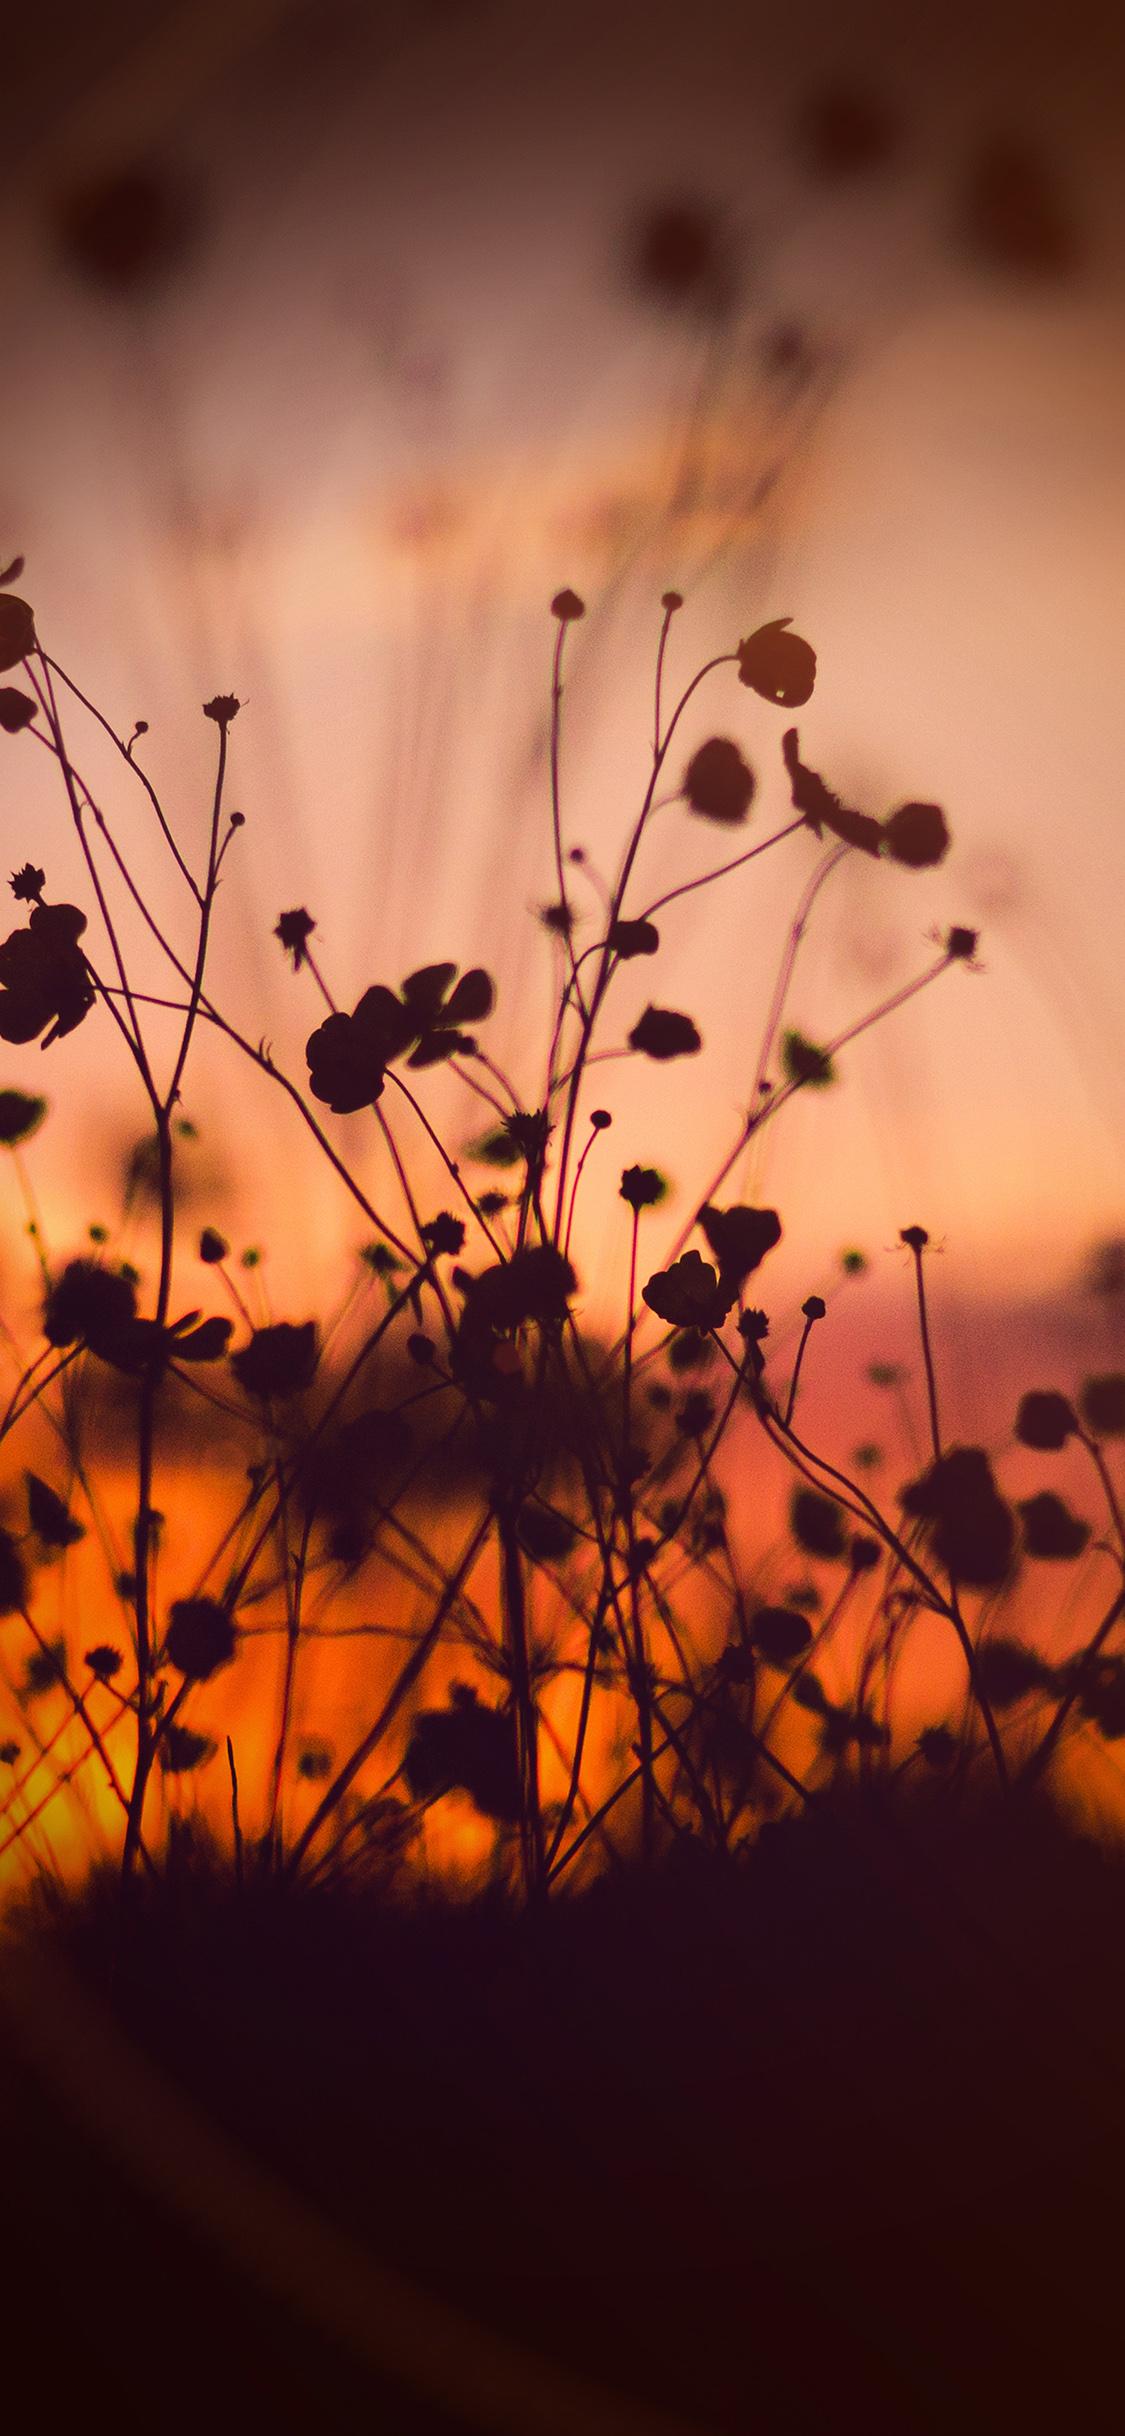 iPhonexpapers.com-Apple-iPhone-wallpaper-mv67-night-nature-flower-sunset-dark-shadow-orange-flare